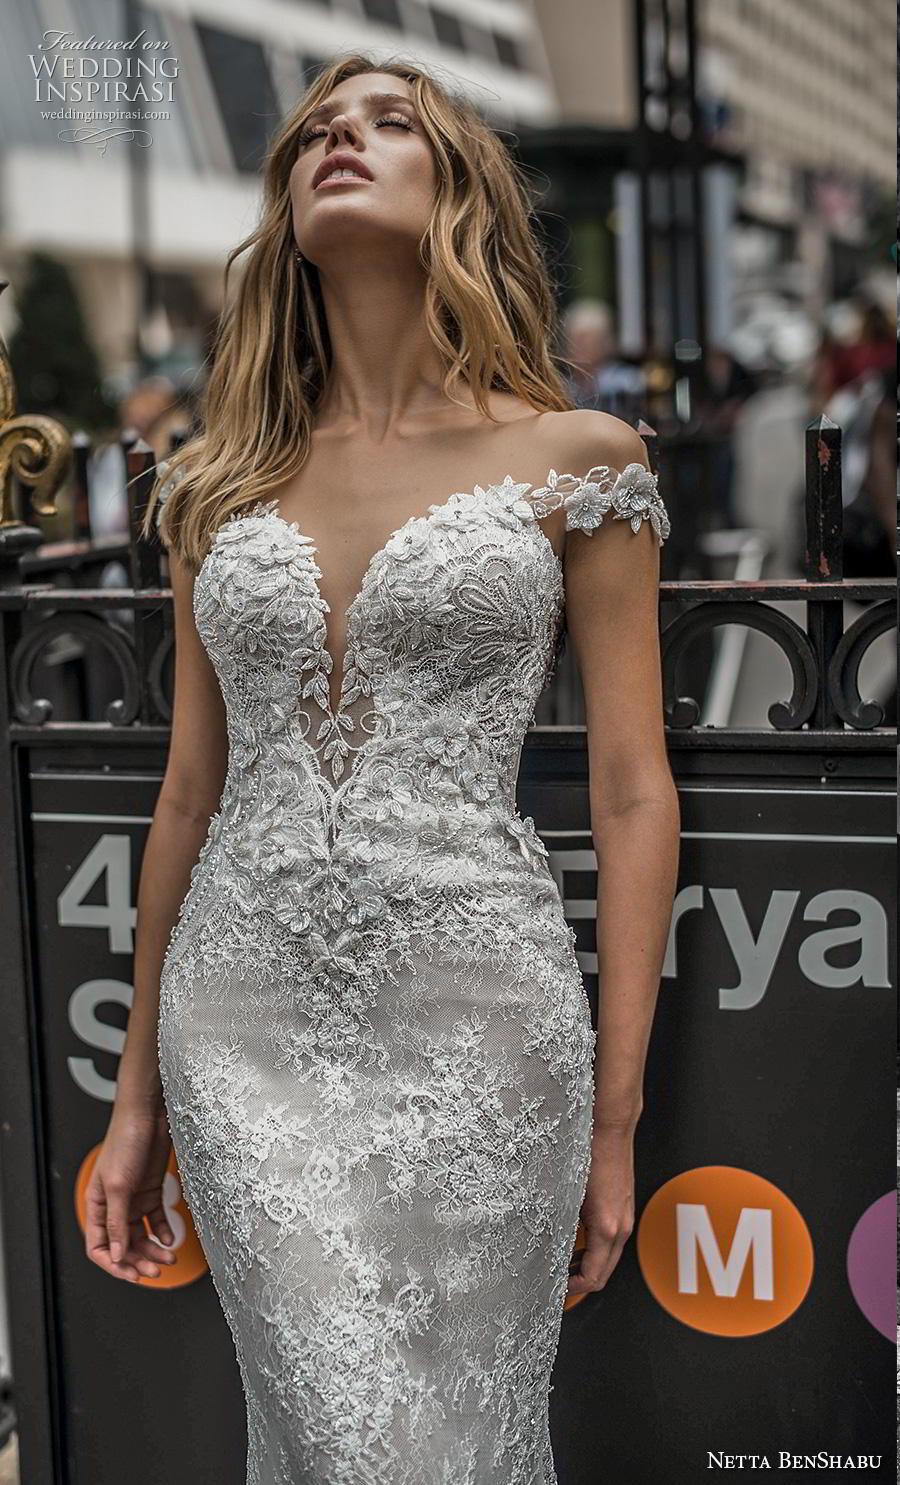 netta benshabu fall 2019 bridal off the shoulder cap sleeves deep plunging sweetheart neckline elegant fit and flare wedding dress backless v back medium train (9) zv